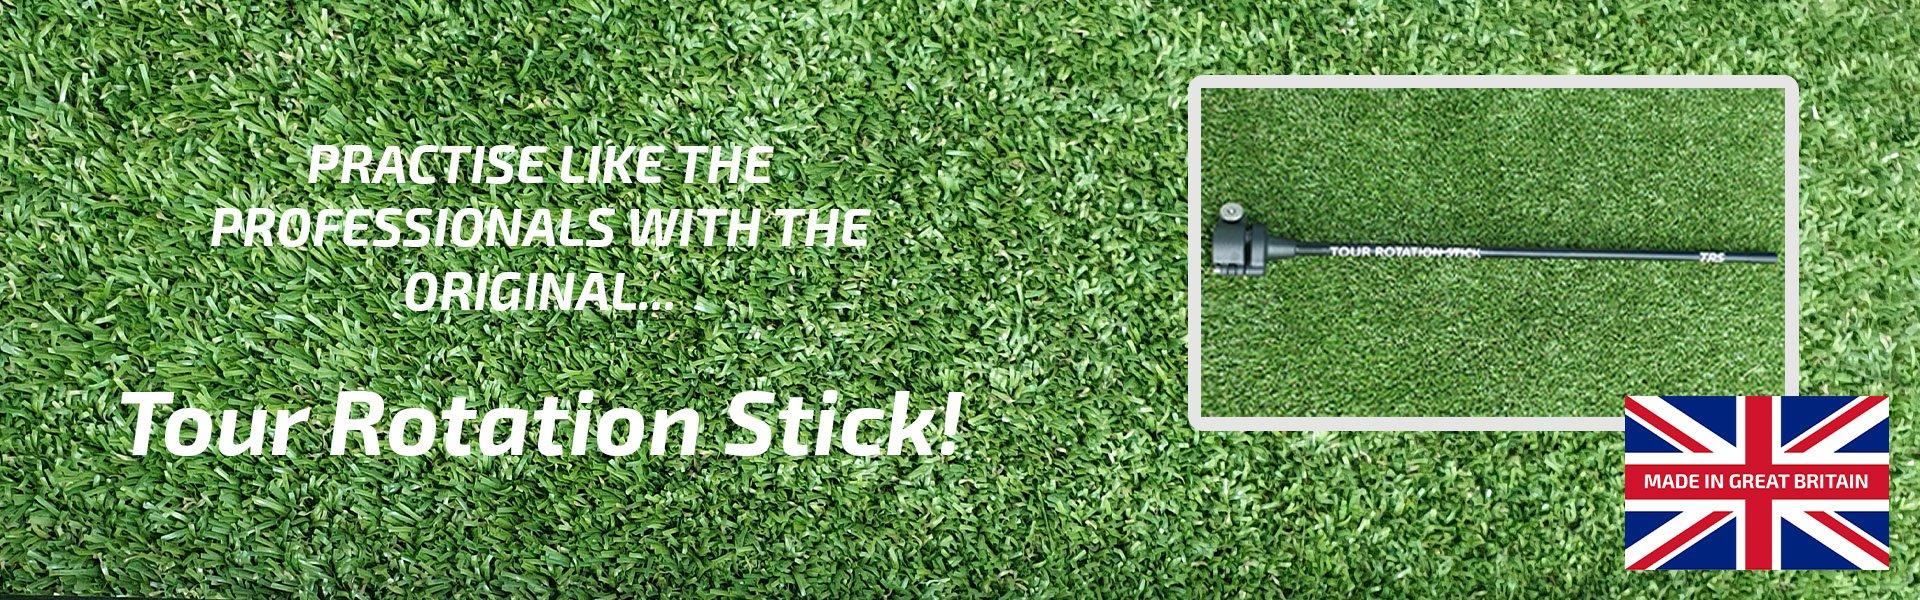 Tour Rotation Stick